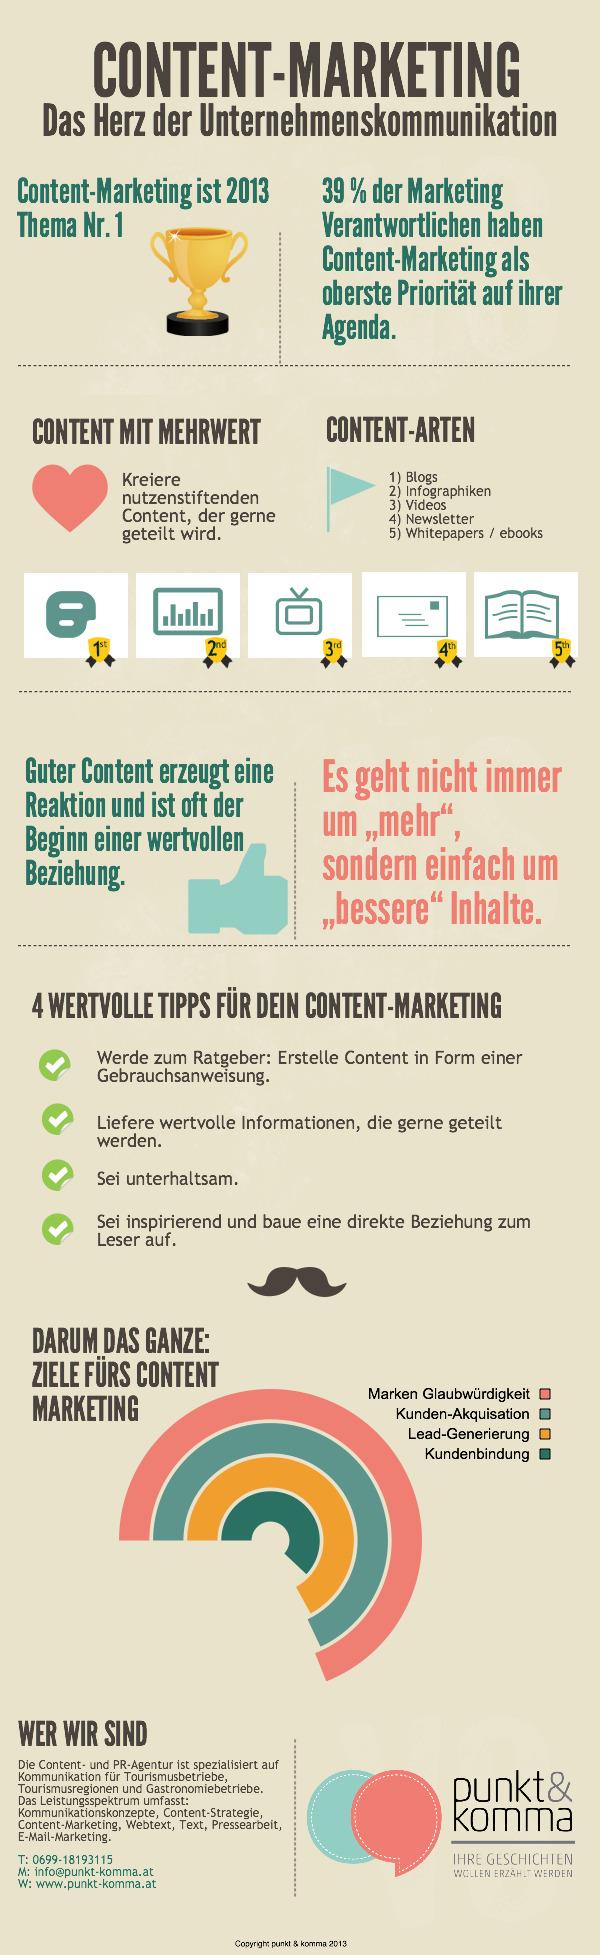 Content Marketing-Infografik: 4 wertvolle Tipps | Contentagentur punkt & komma